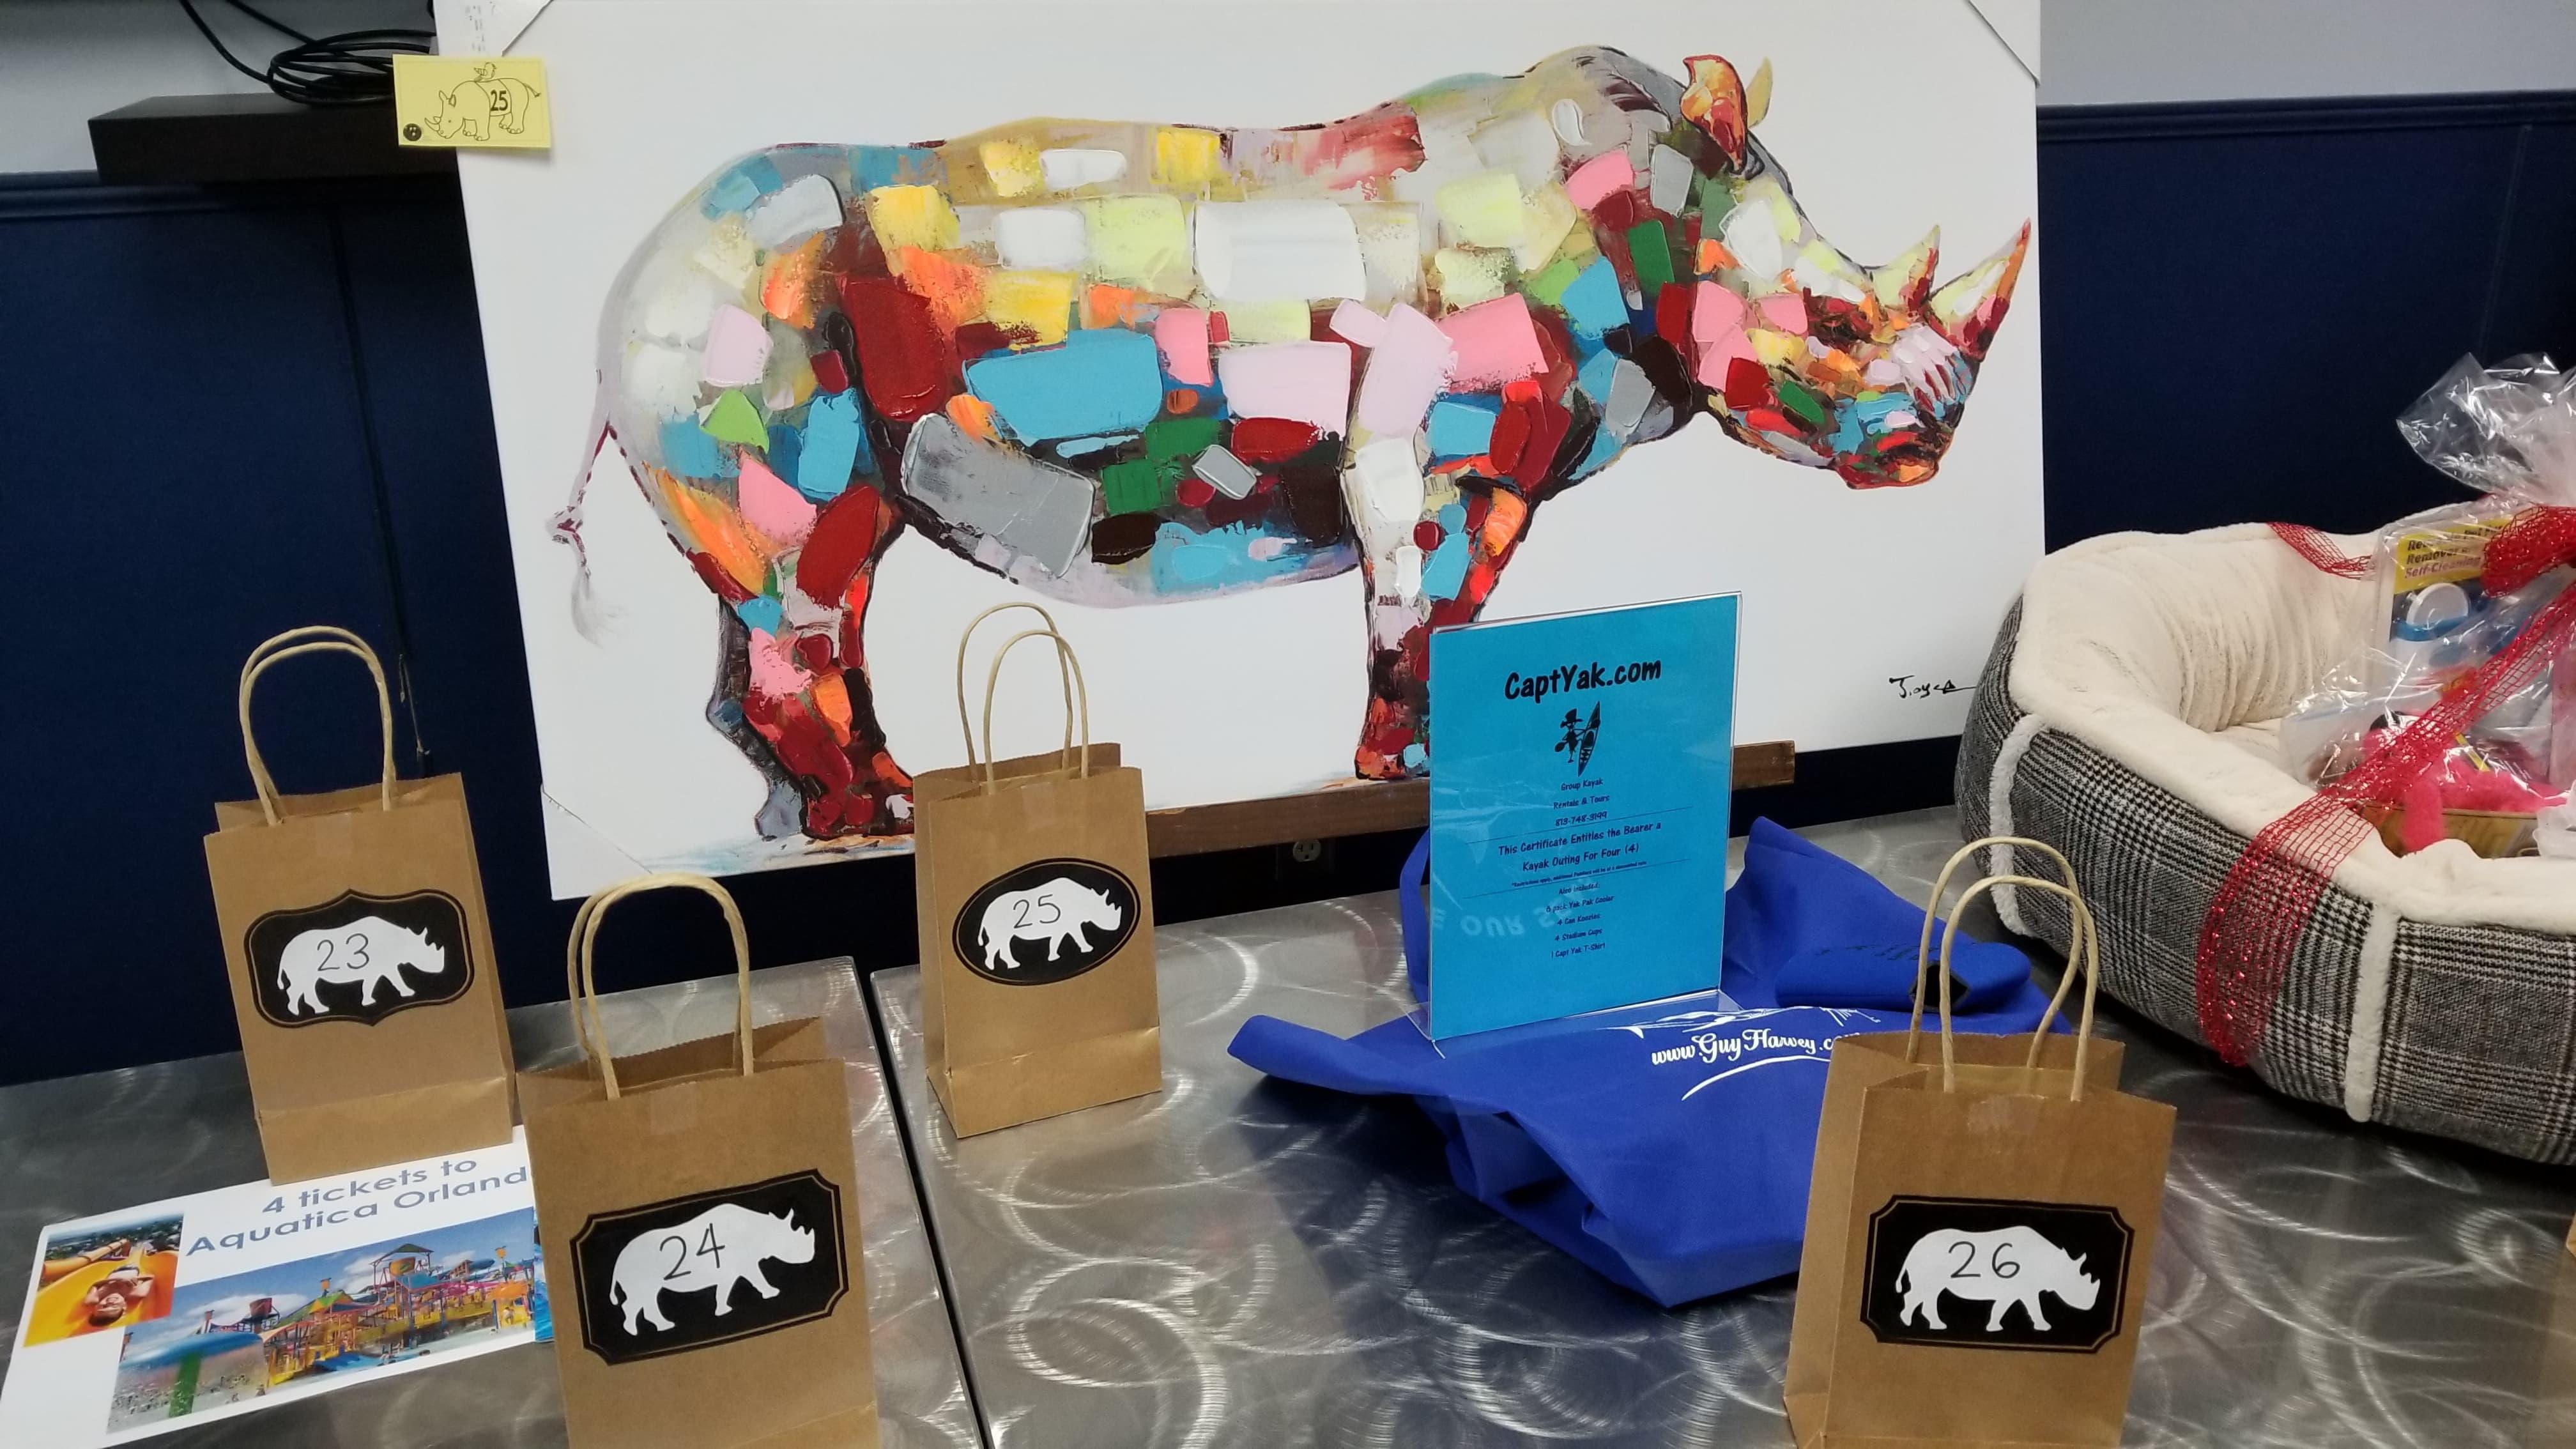 Bowling for rhinos, rhino conservation, raffle prizes,